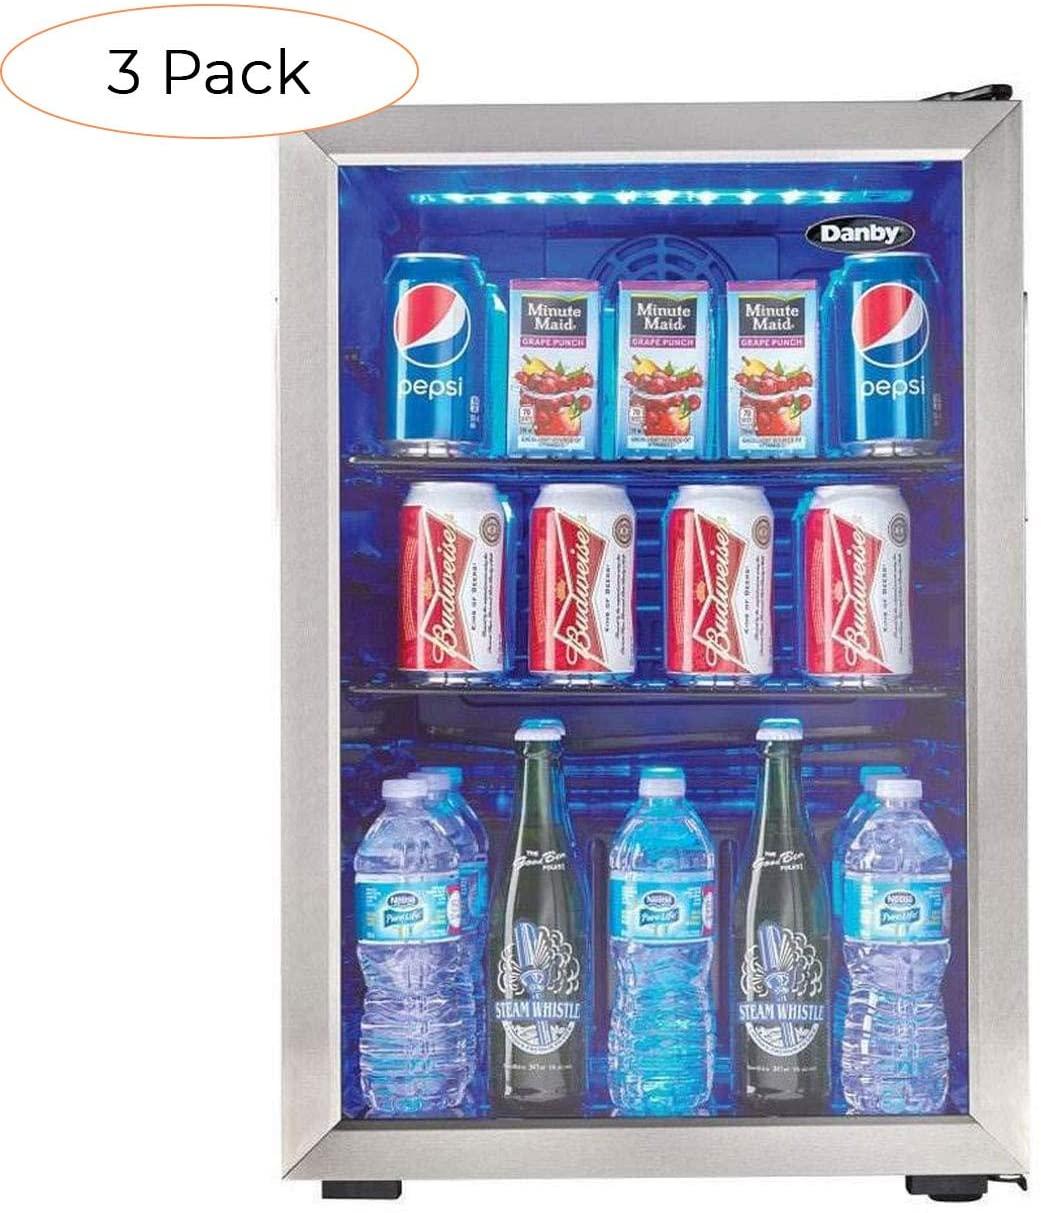 Danby 95 Can 2.6 Cu. Ft. Free Standing Beverage Center Mini Fridge w/Glass Door (3 Pack)